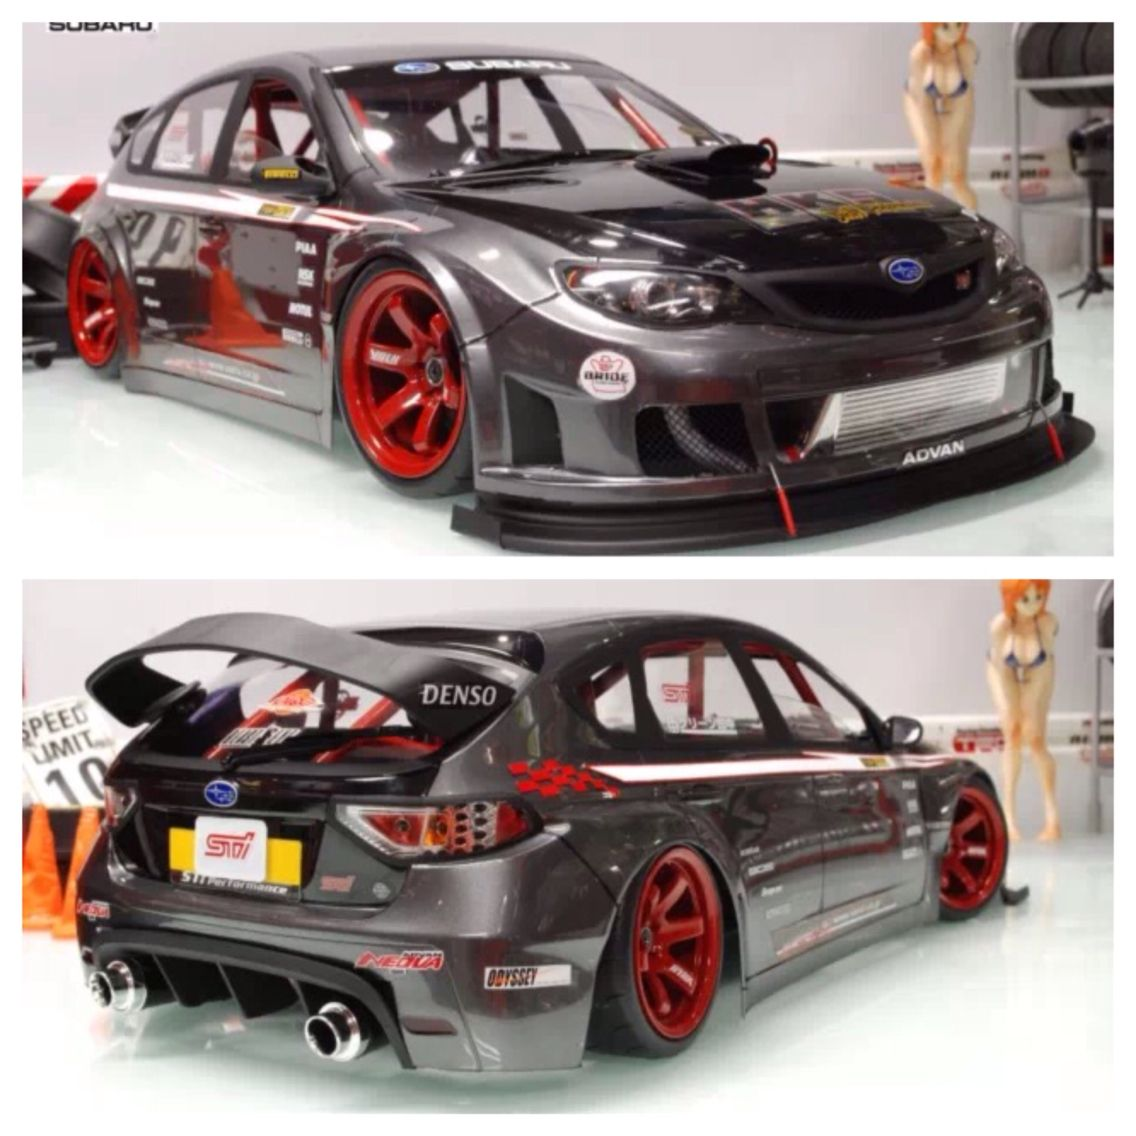 Subaru Impreza Sti Rc Drift Car Rc Cars Pinterest Cars